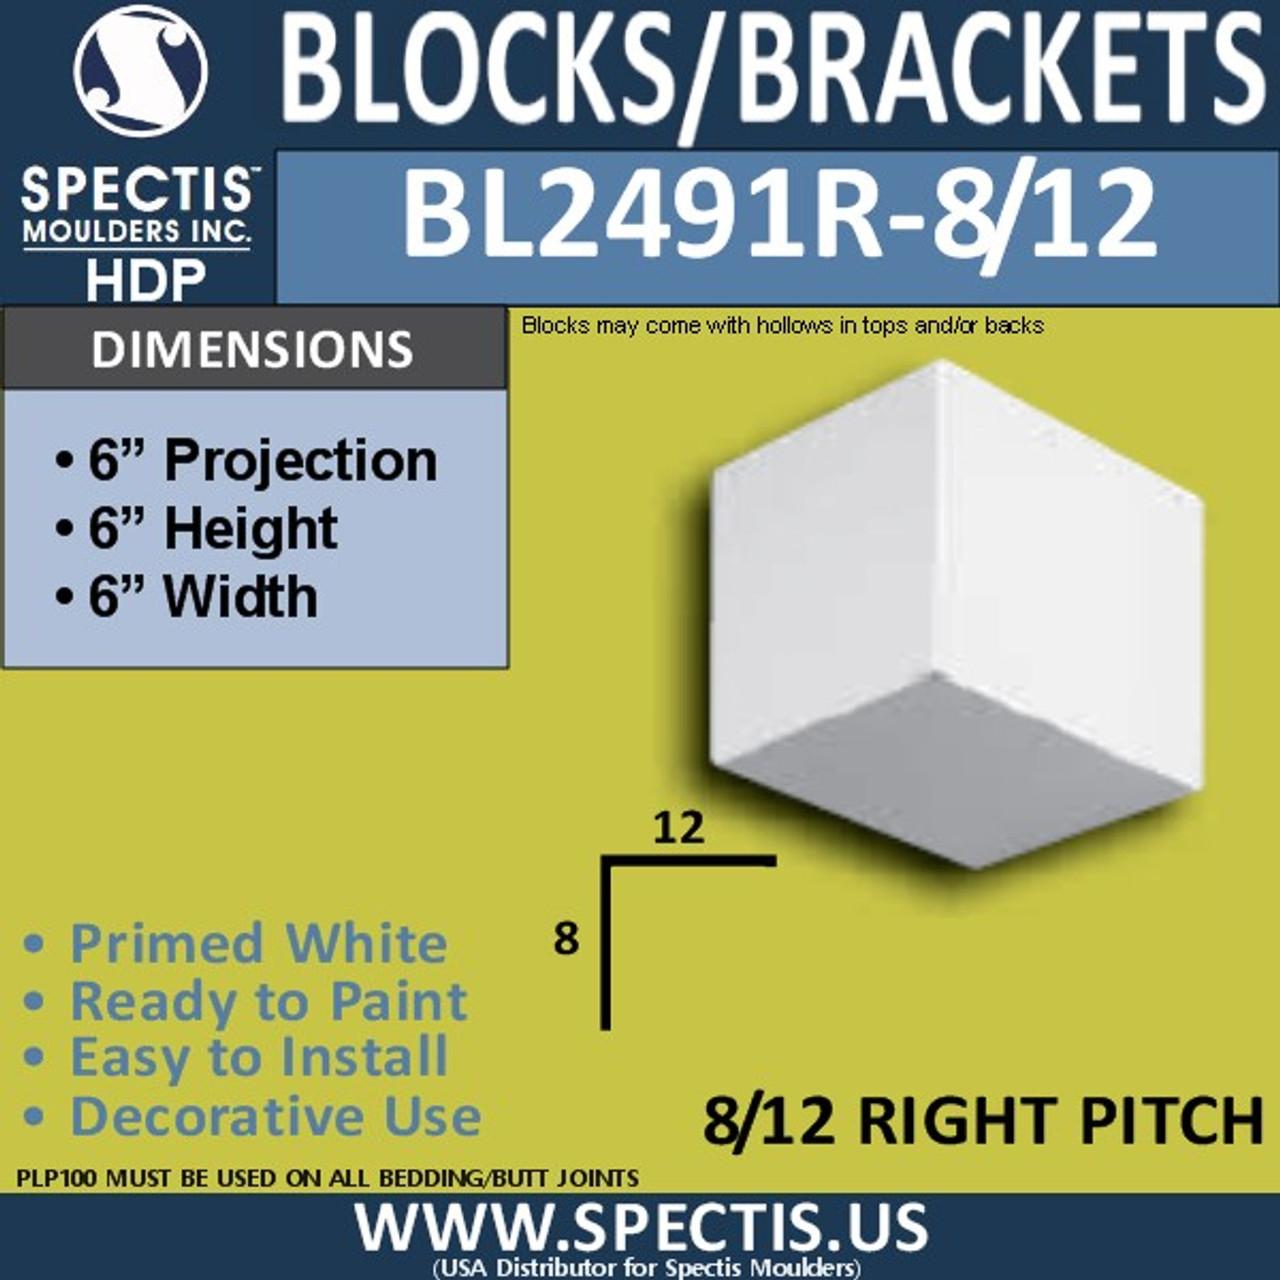 "BL2491R-8/12 Pitch Eave Block or Bracket 6""W x 6""H x 6"" P"